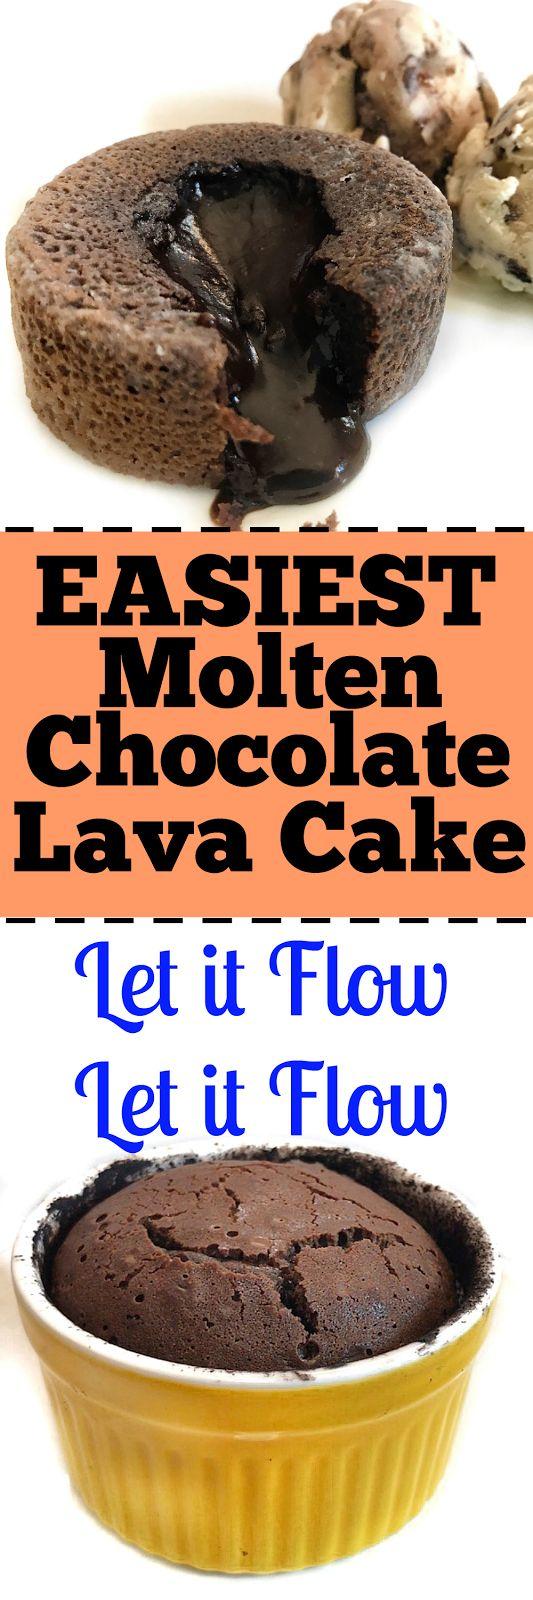 Easy to make Molten Lava Cake that flowss flowss flowss. Gooeeyy Chocolatey!